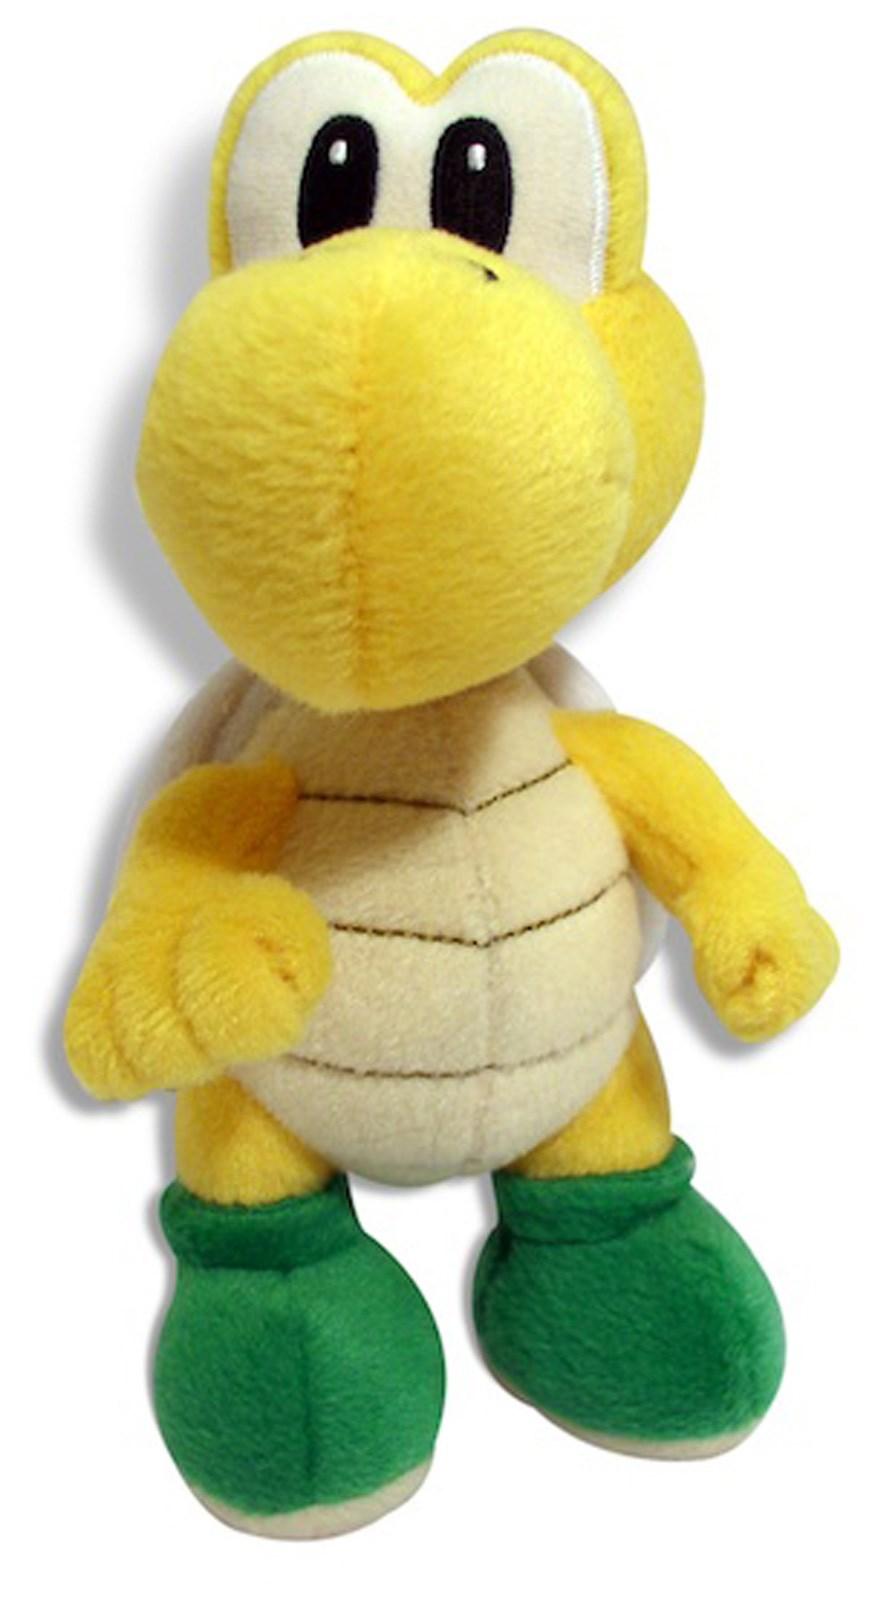 Image of Super Mario Bros. Koopa Troopa Plush